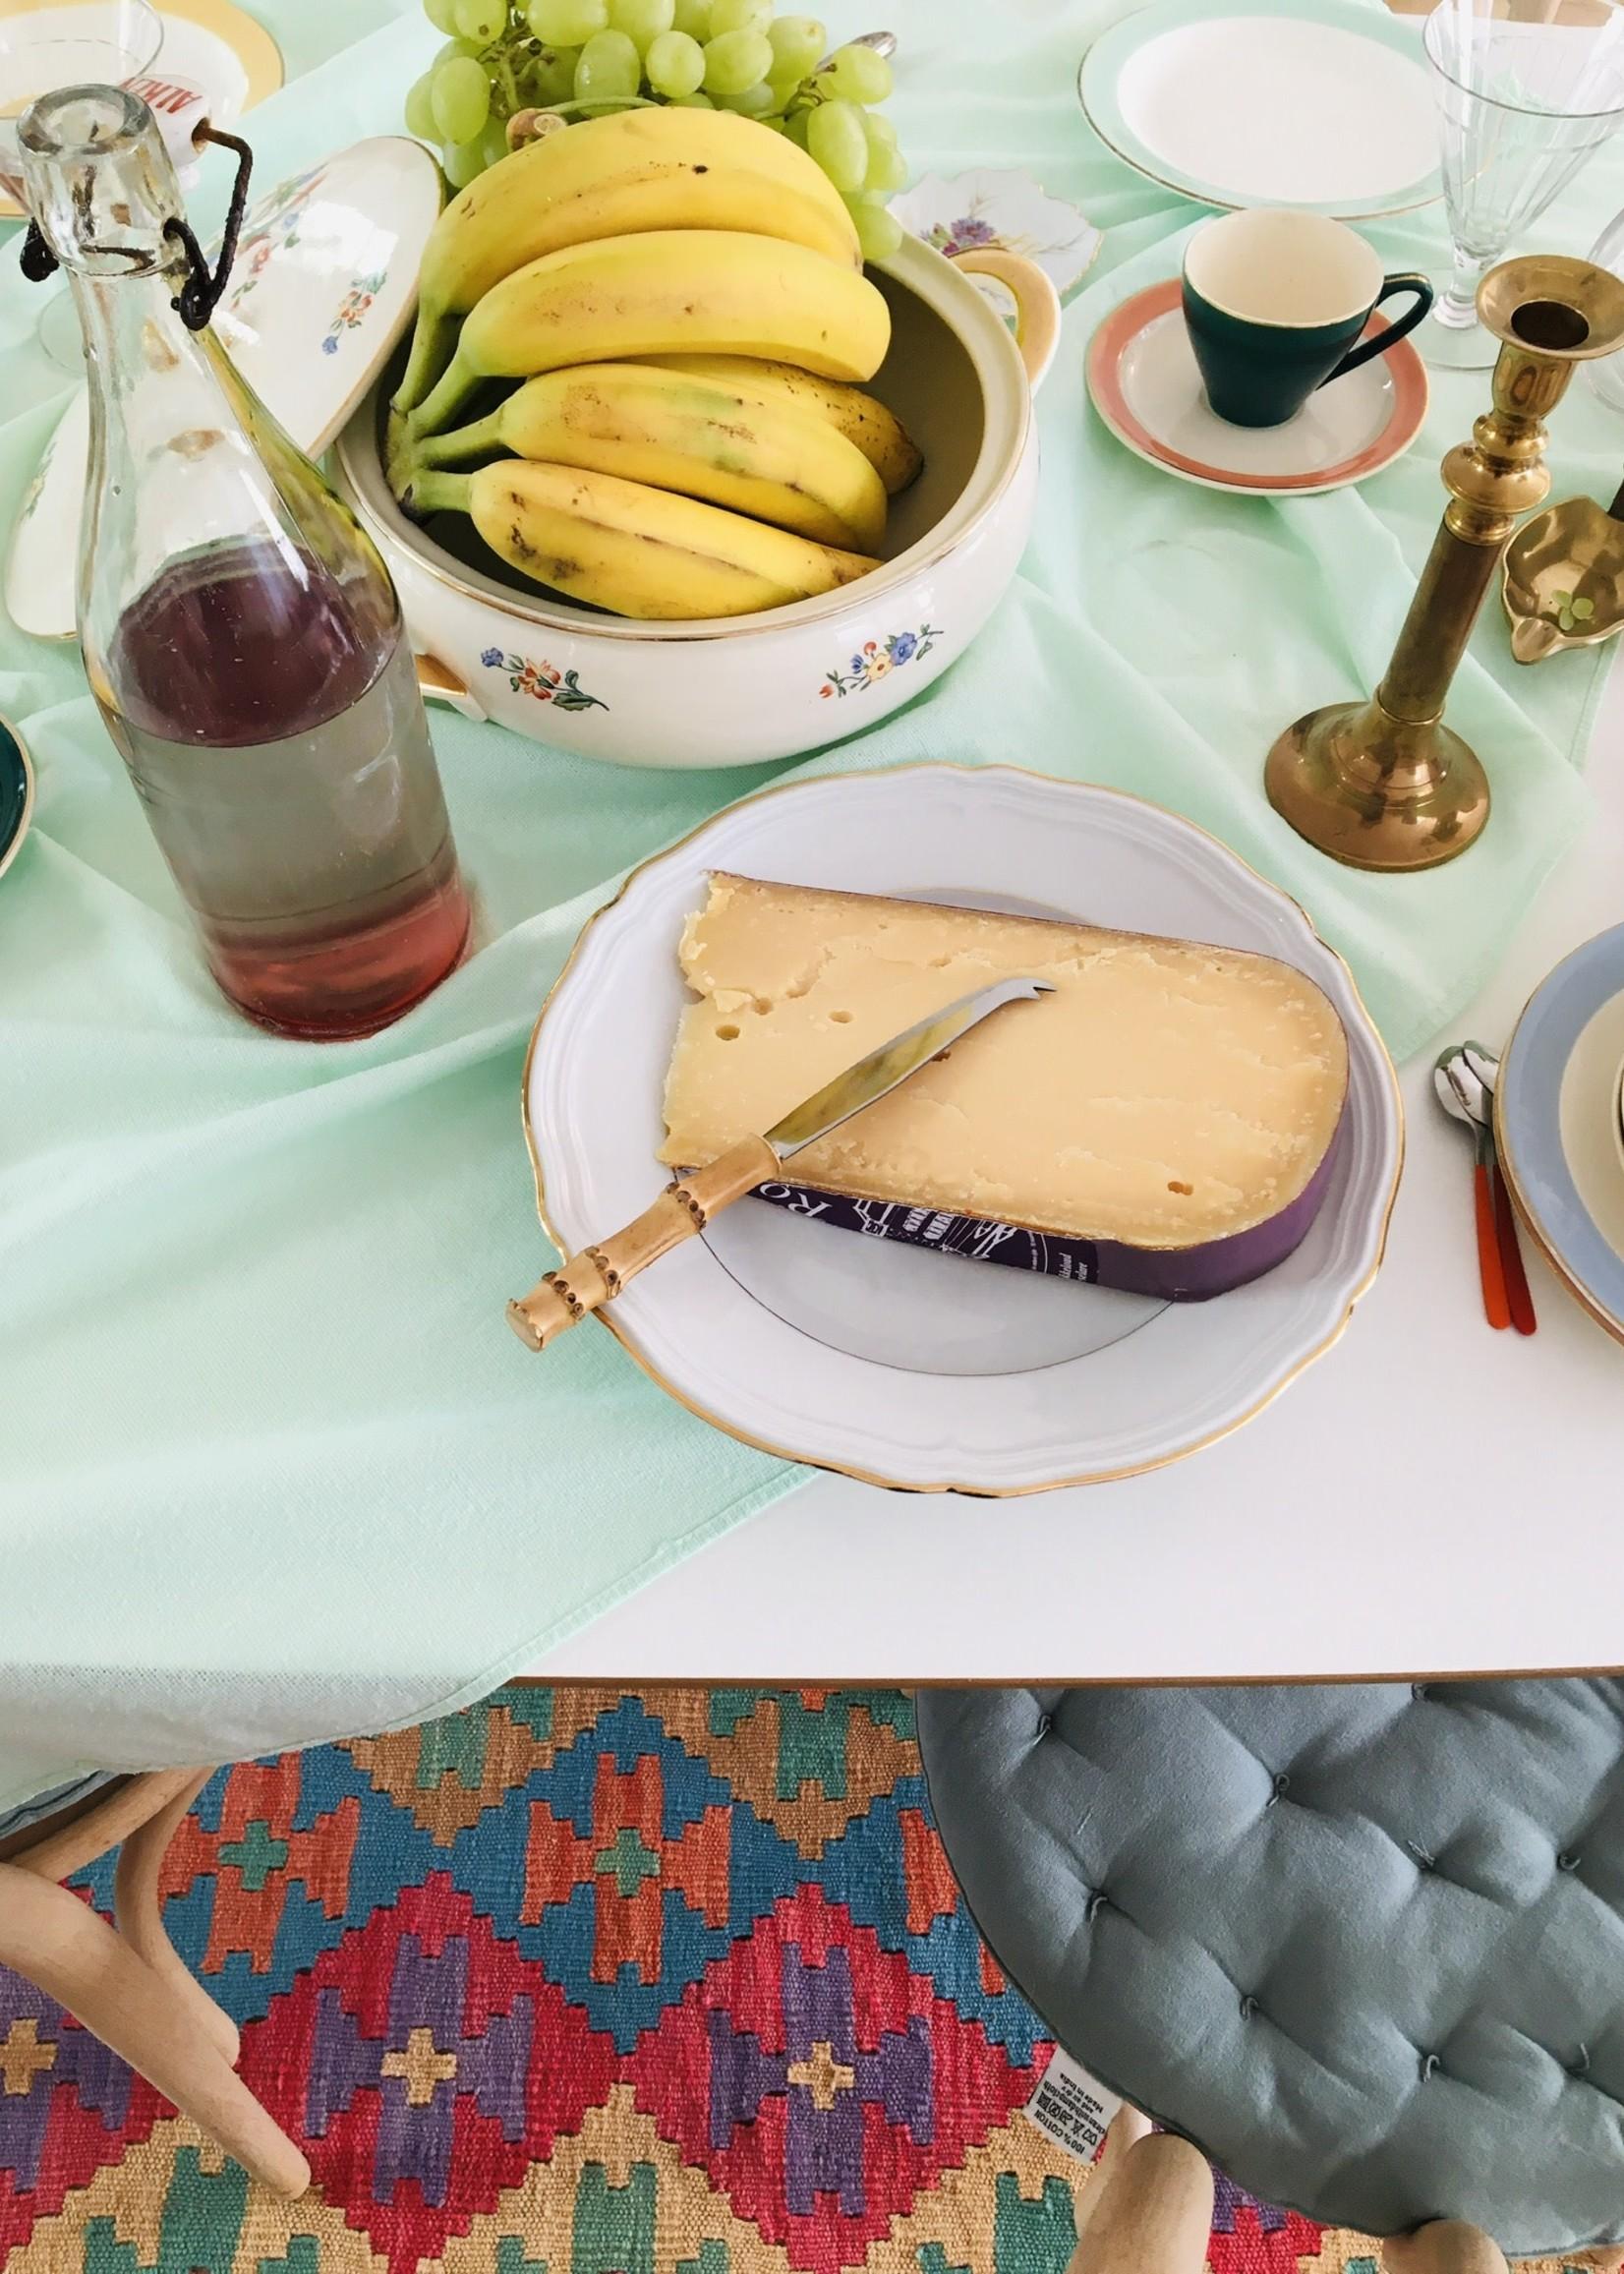 Bamboo cheese knife